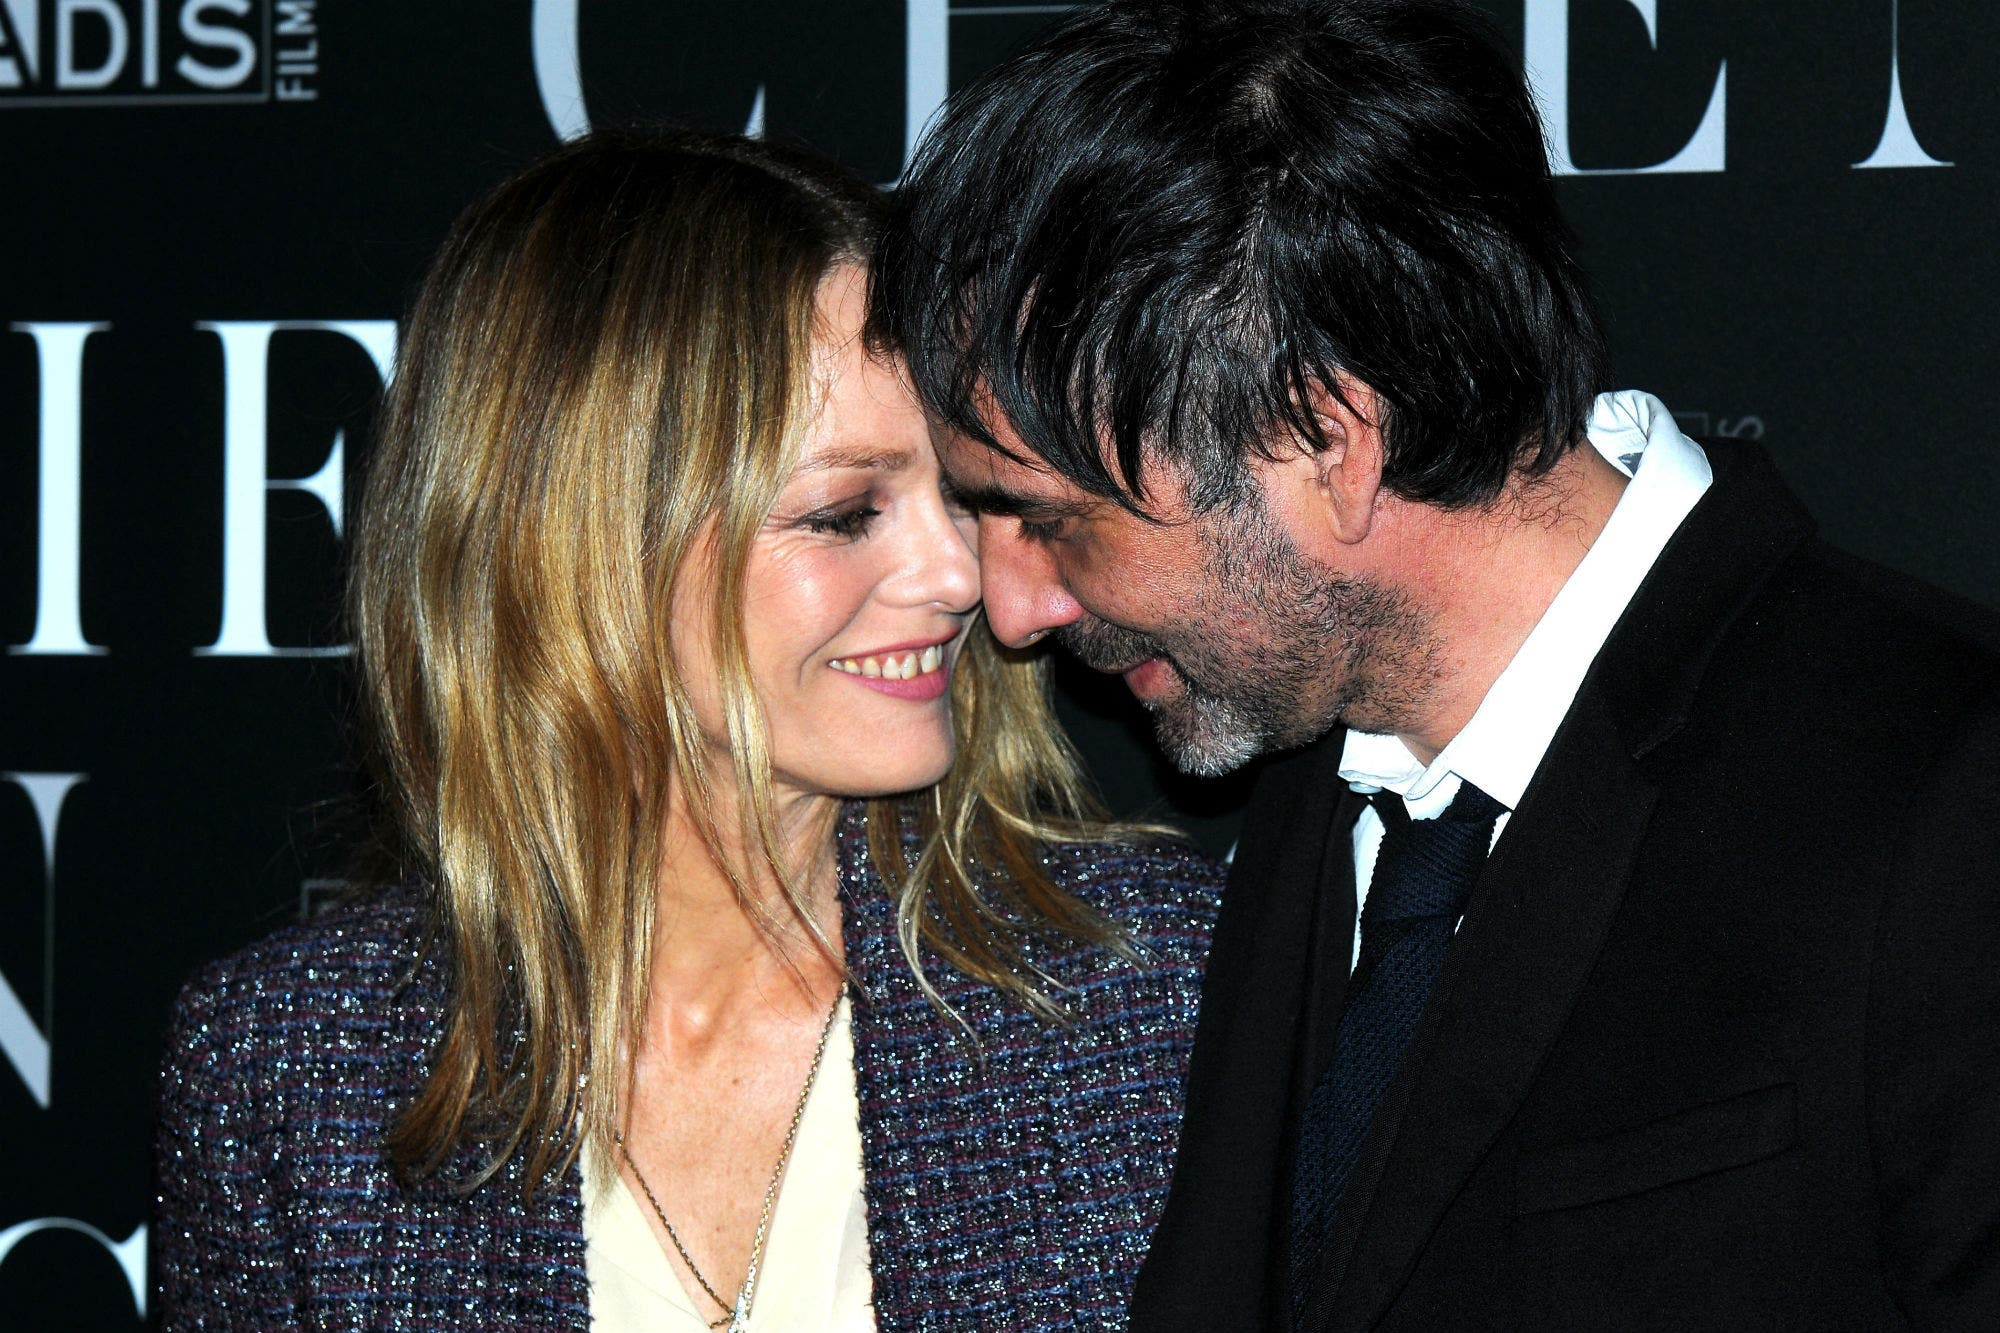 Vanessa Paradis, ex-wife of Johnny Depp, married in Paris